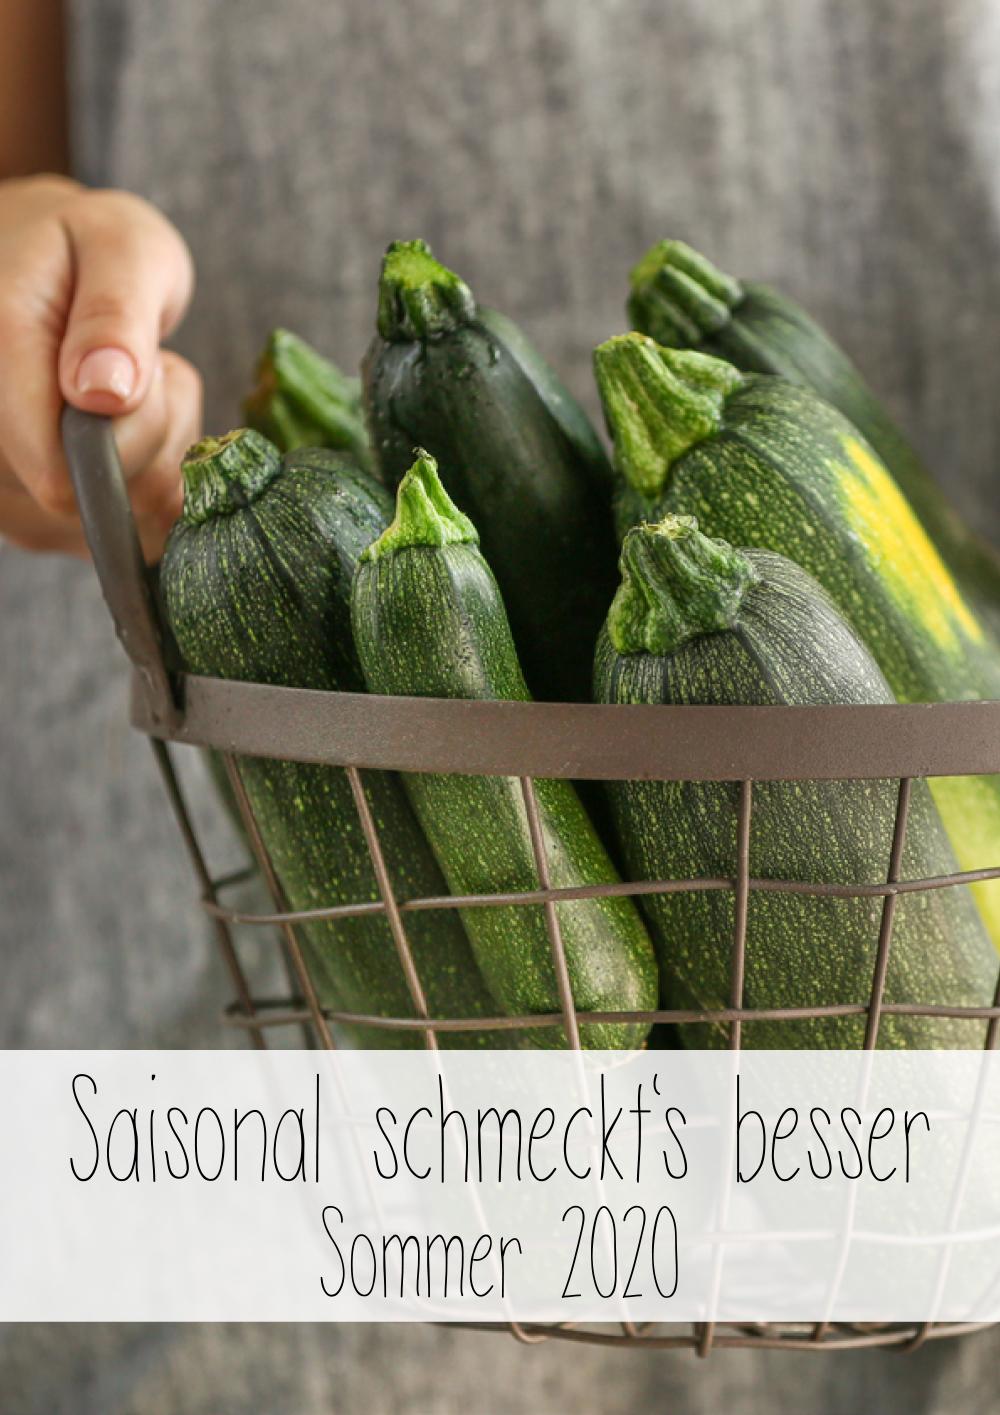 Saisonal schmeckts besser - Der Foodblogger Saisonkalender - Sommer 2020